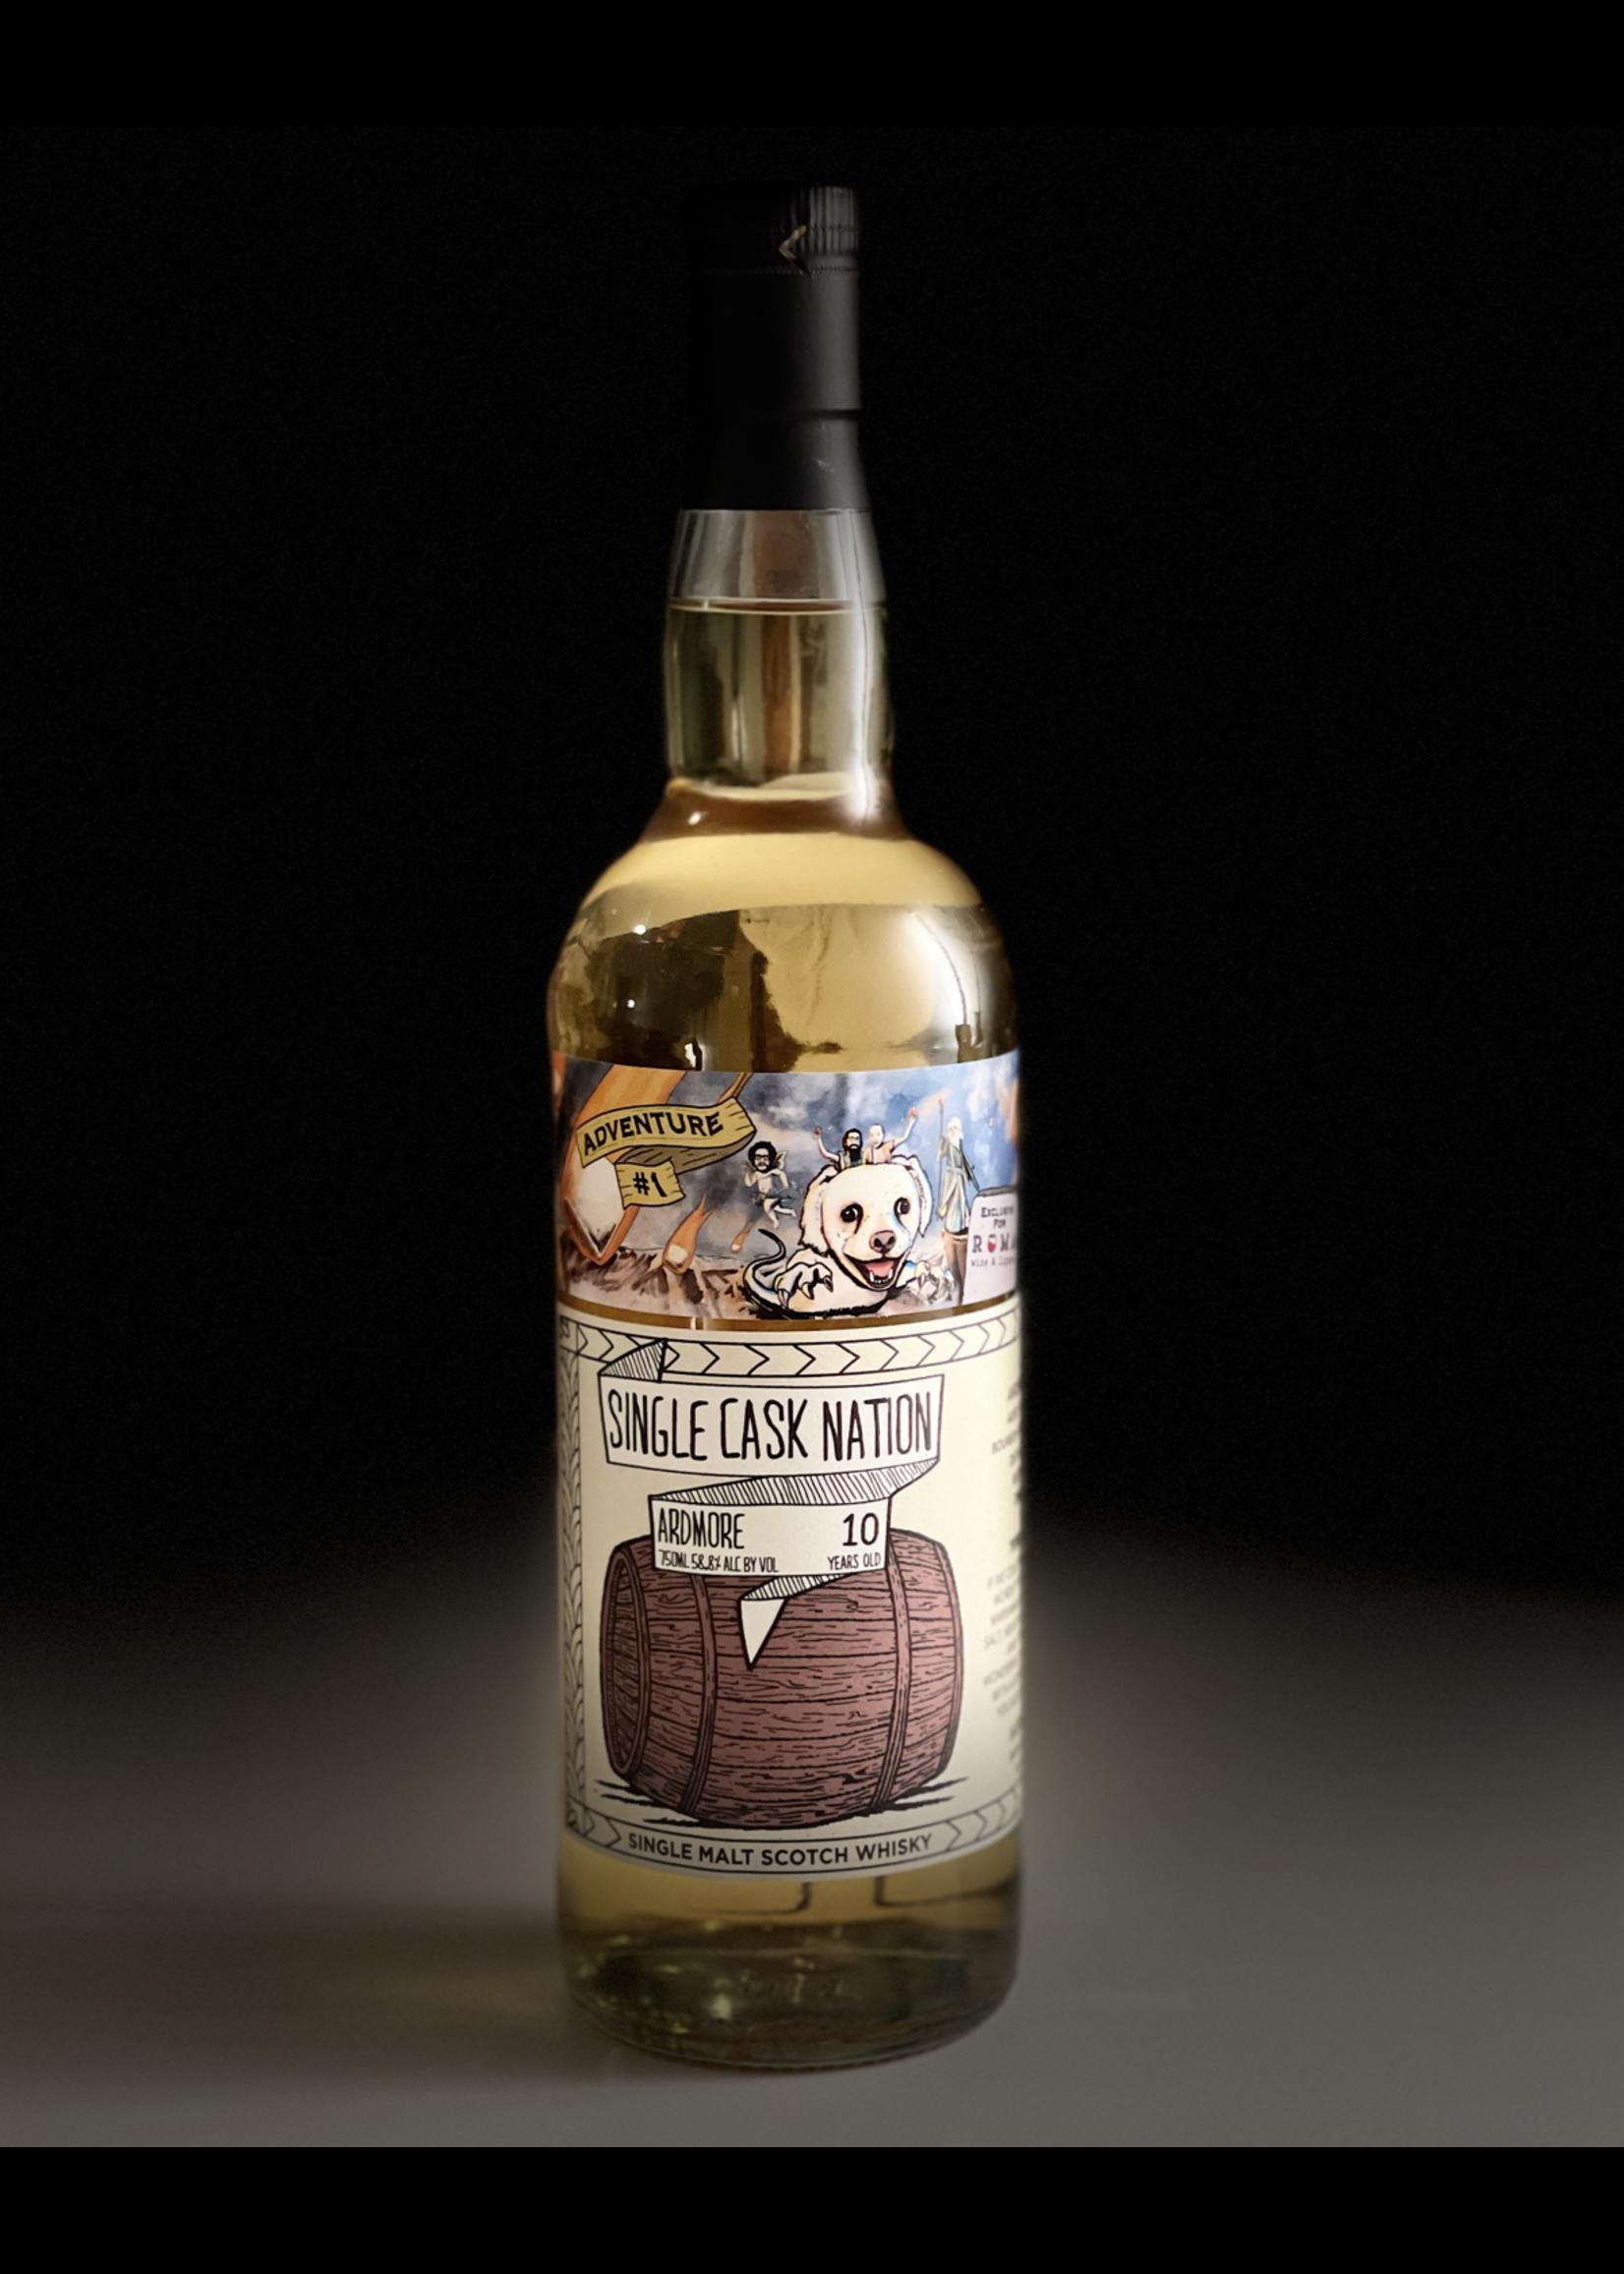 Single Cask Nation Single Cask Nation / Roma Exclusive / Ardmore 10 Year 1st fill Bourbon Hogshead Single Cask / 750mL